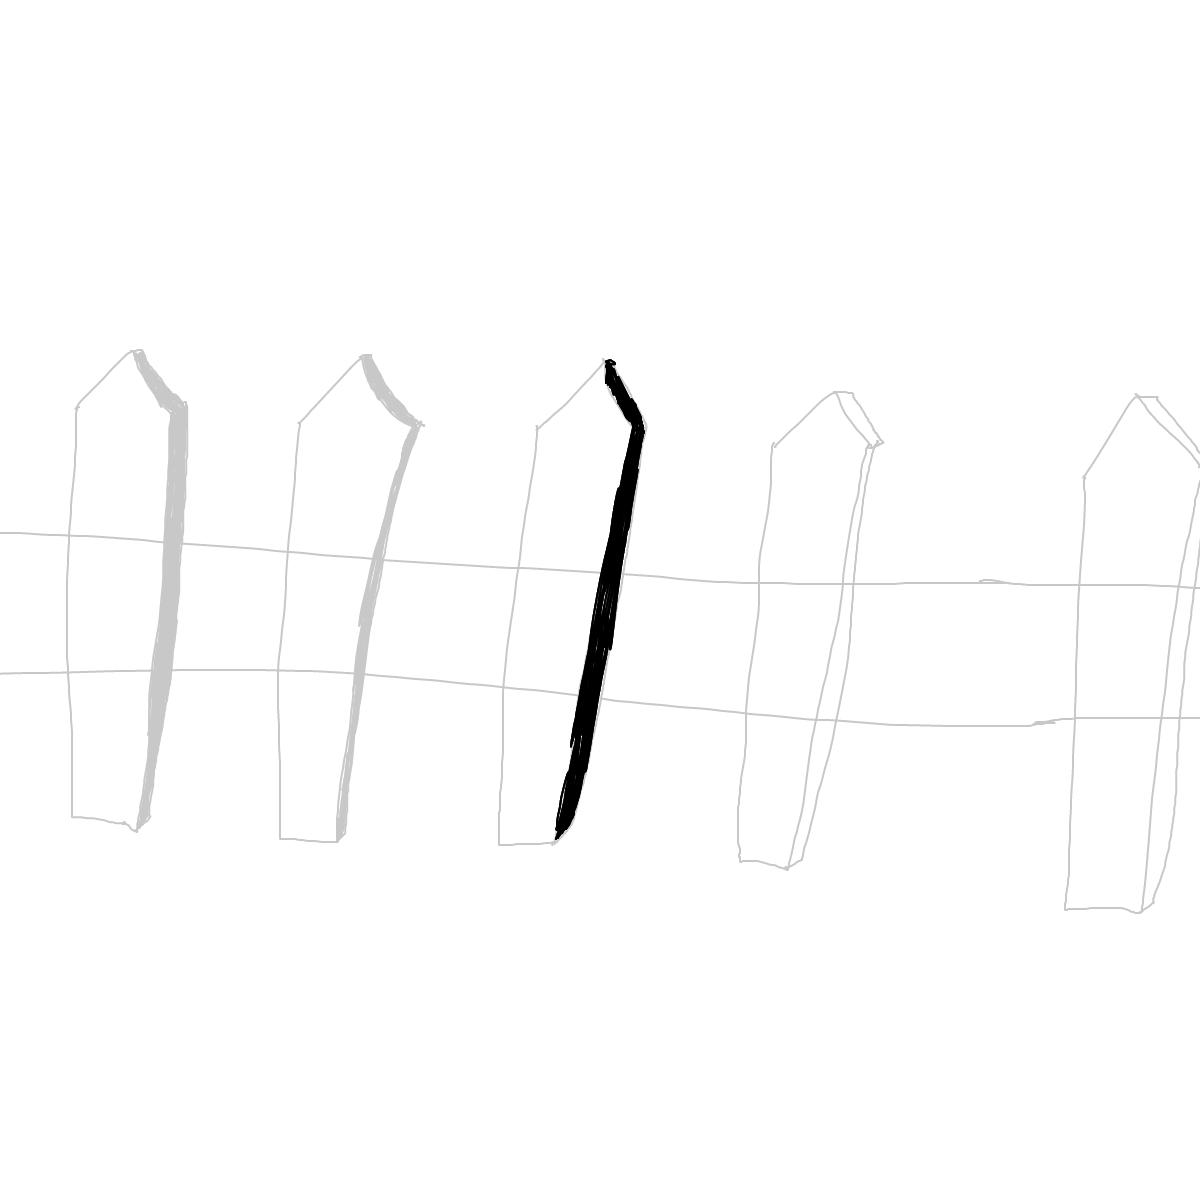 BAAAM drawing#9371 lat:52.4750595092773440lng: 13.4070758819580080